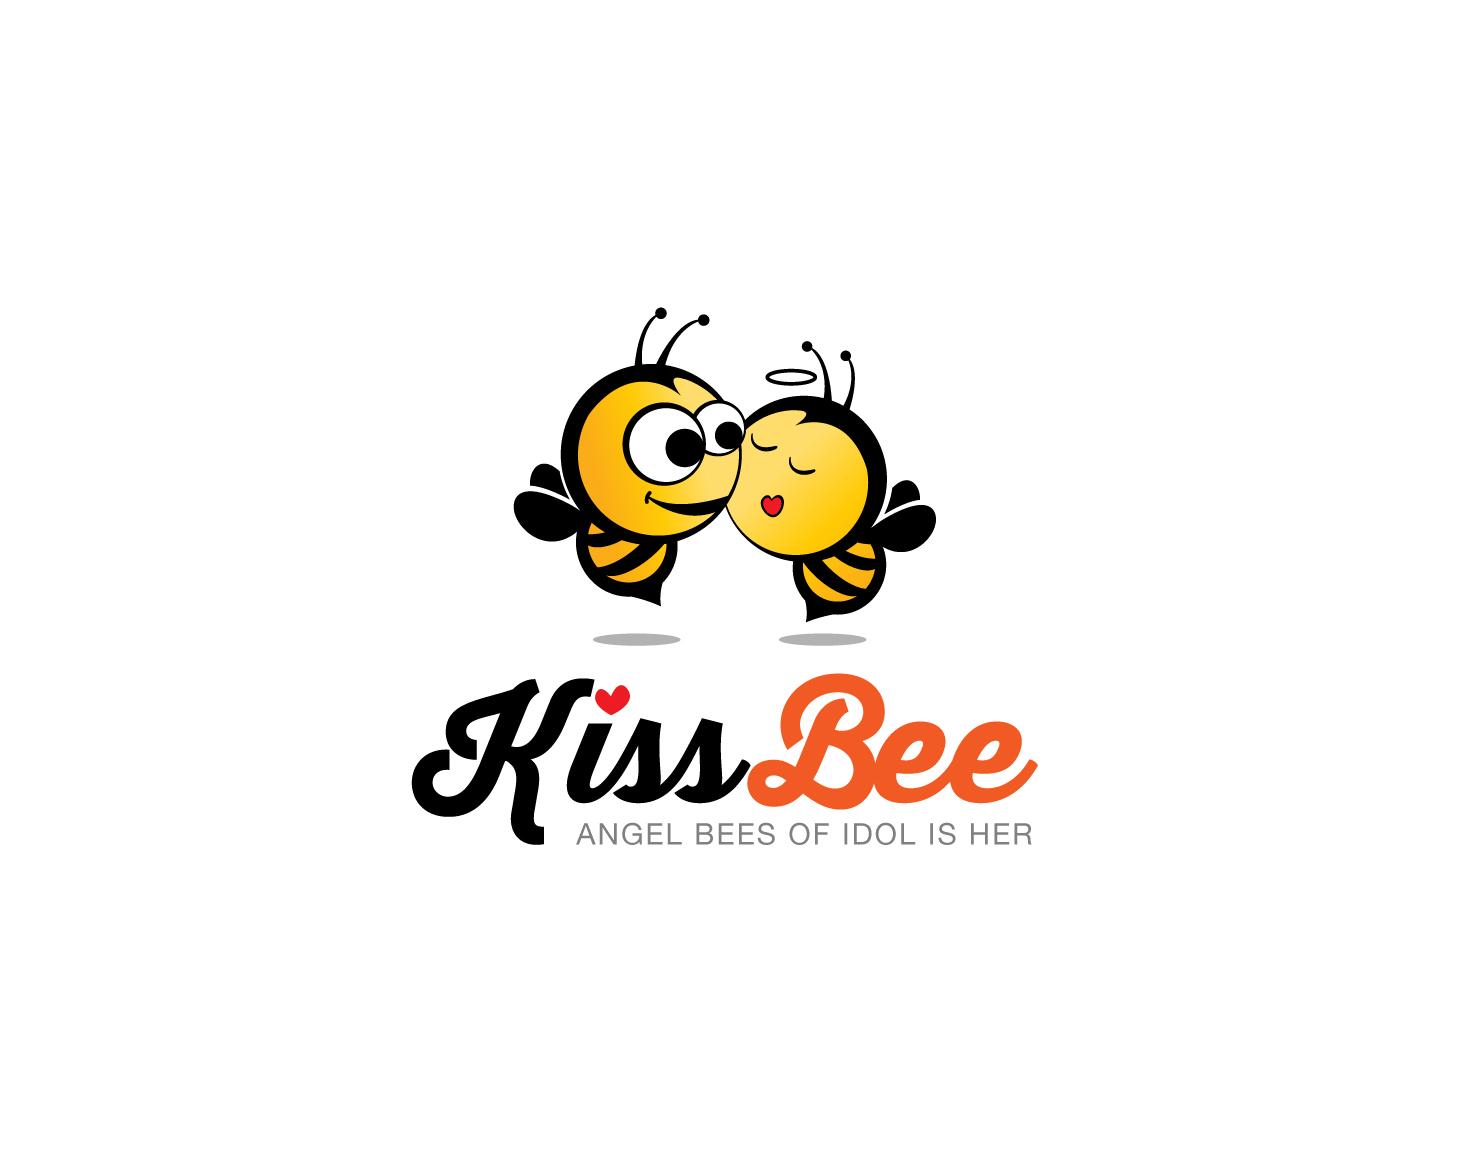 Kiss_bee_1